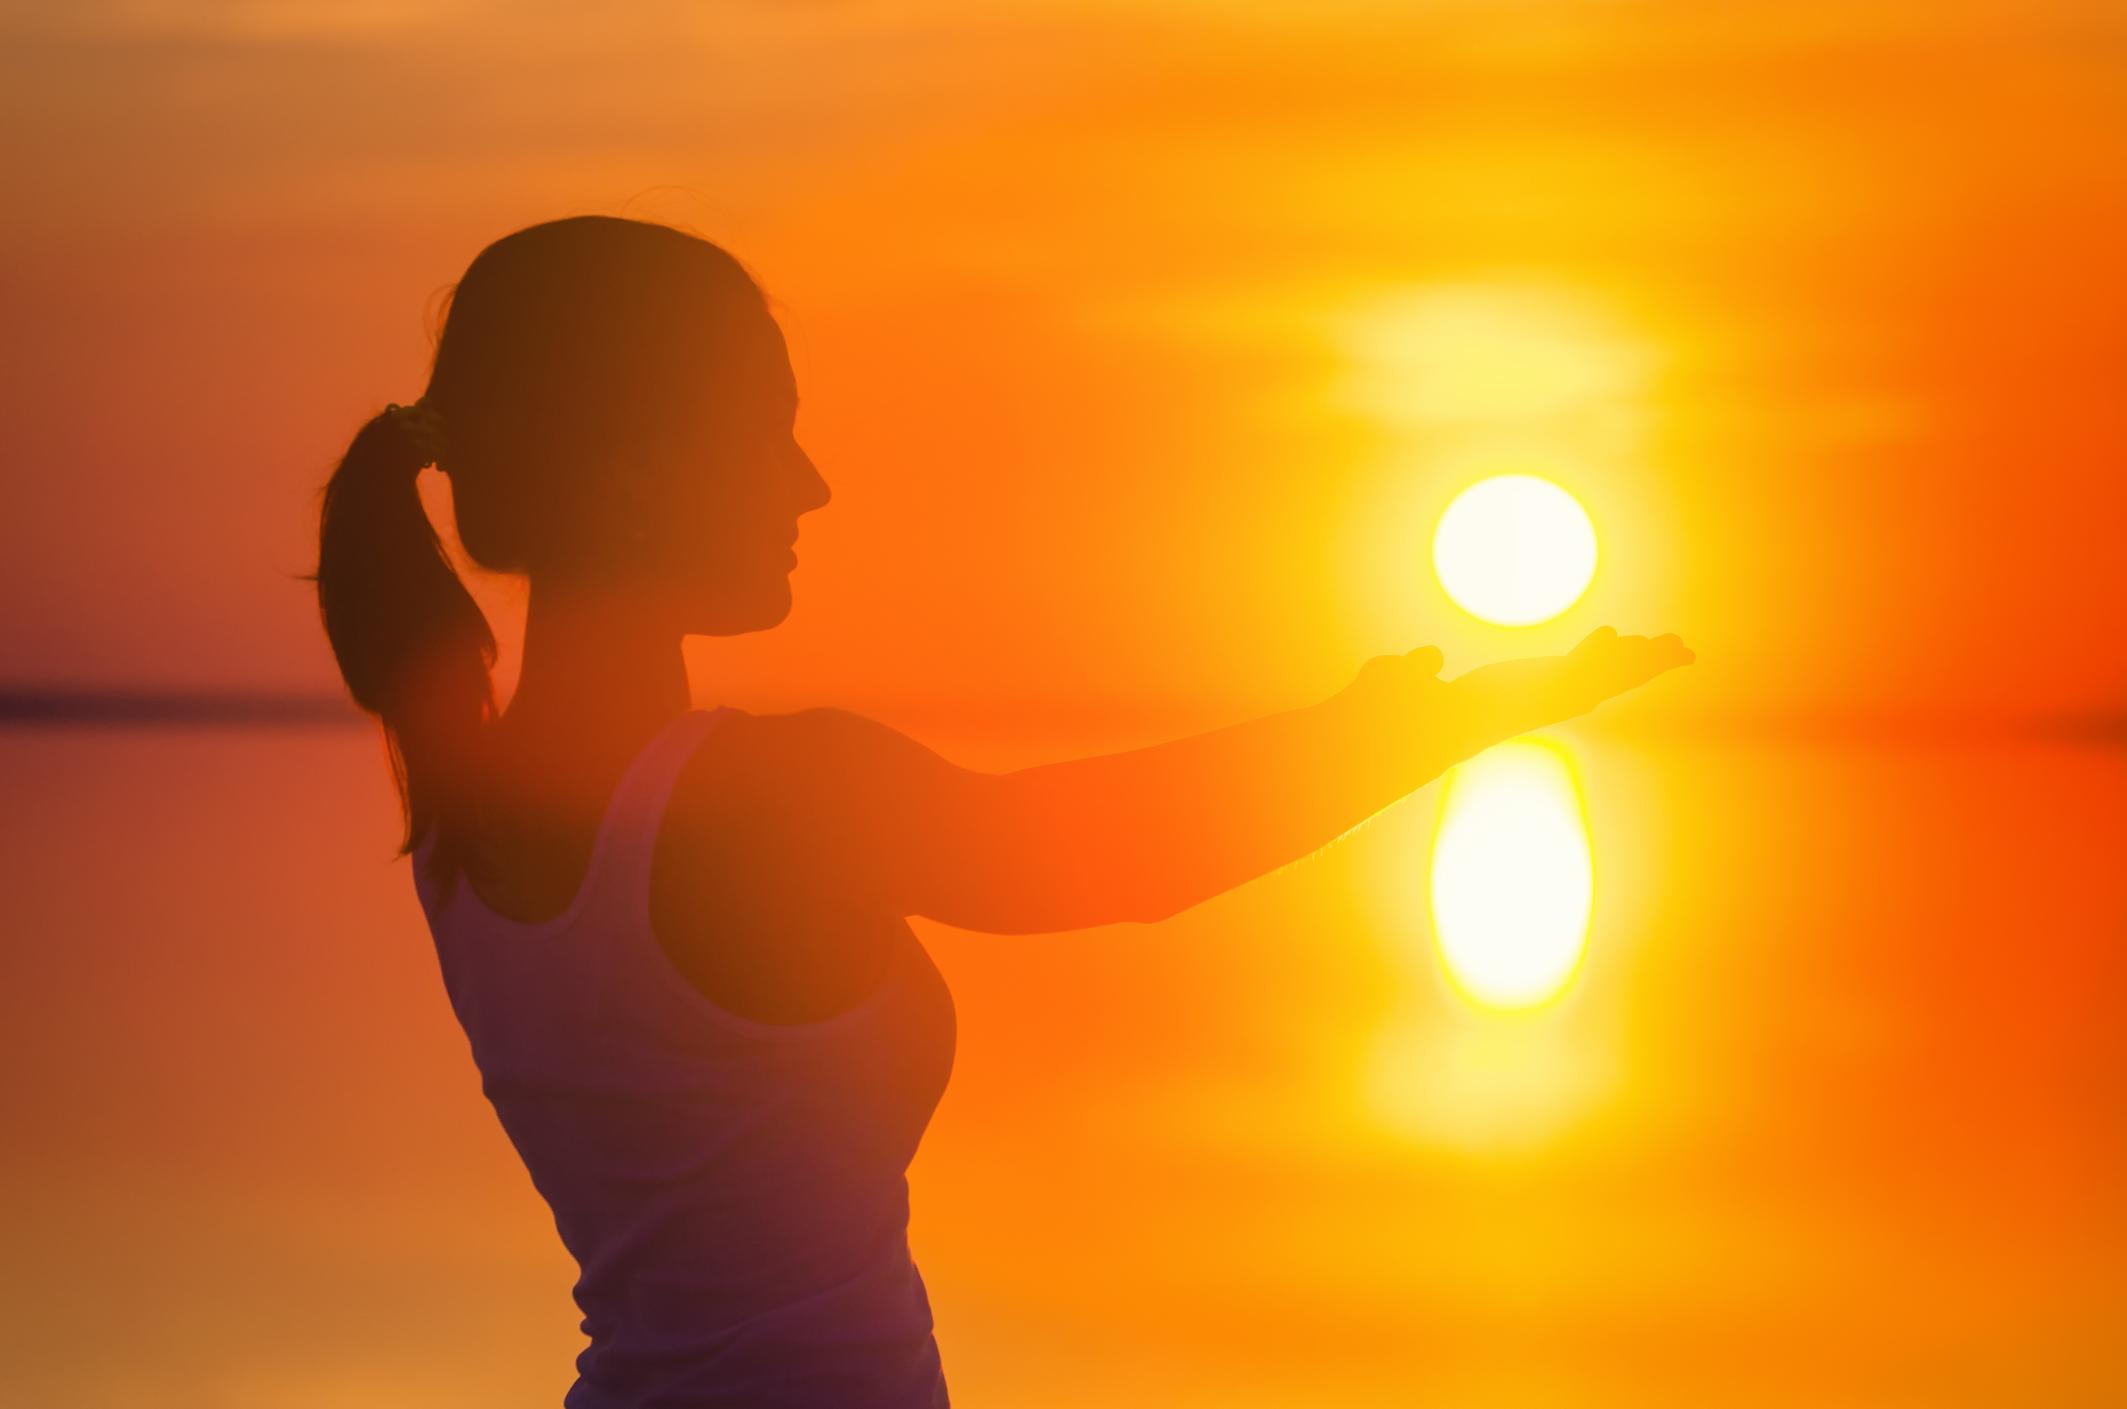 Feeling down? Heath Guru says look directly at the sun (but don't)